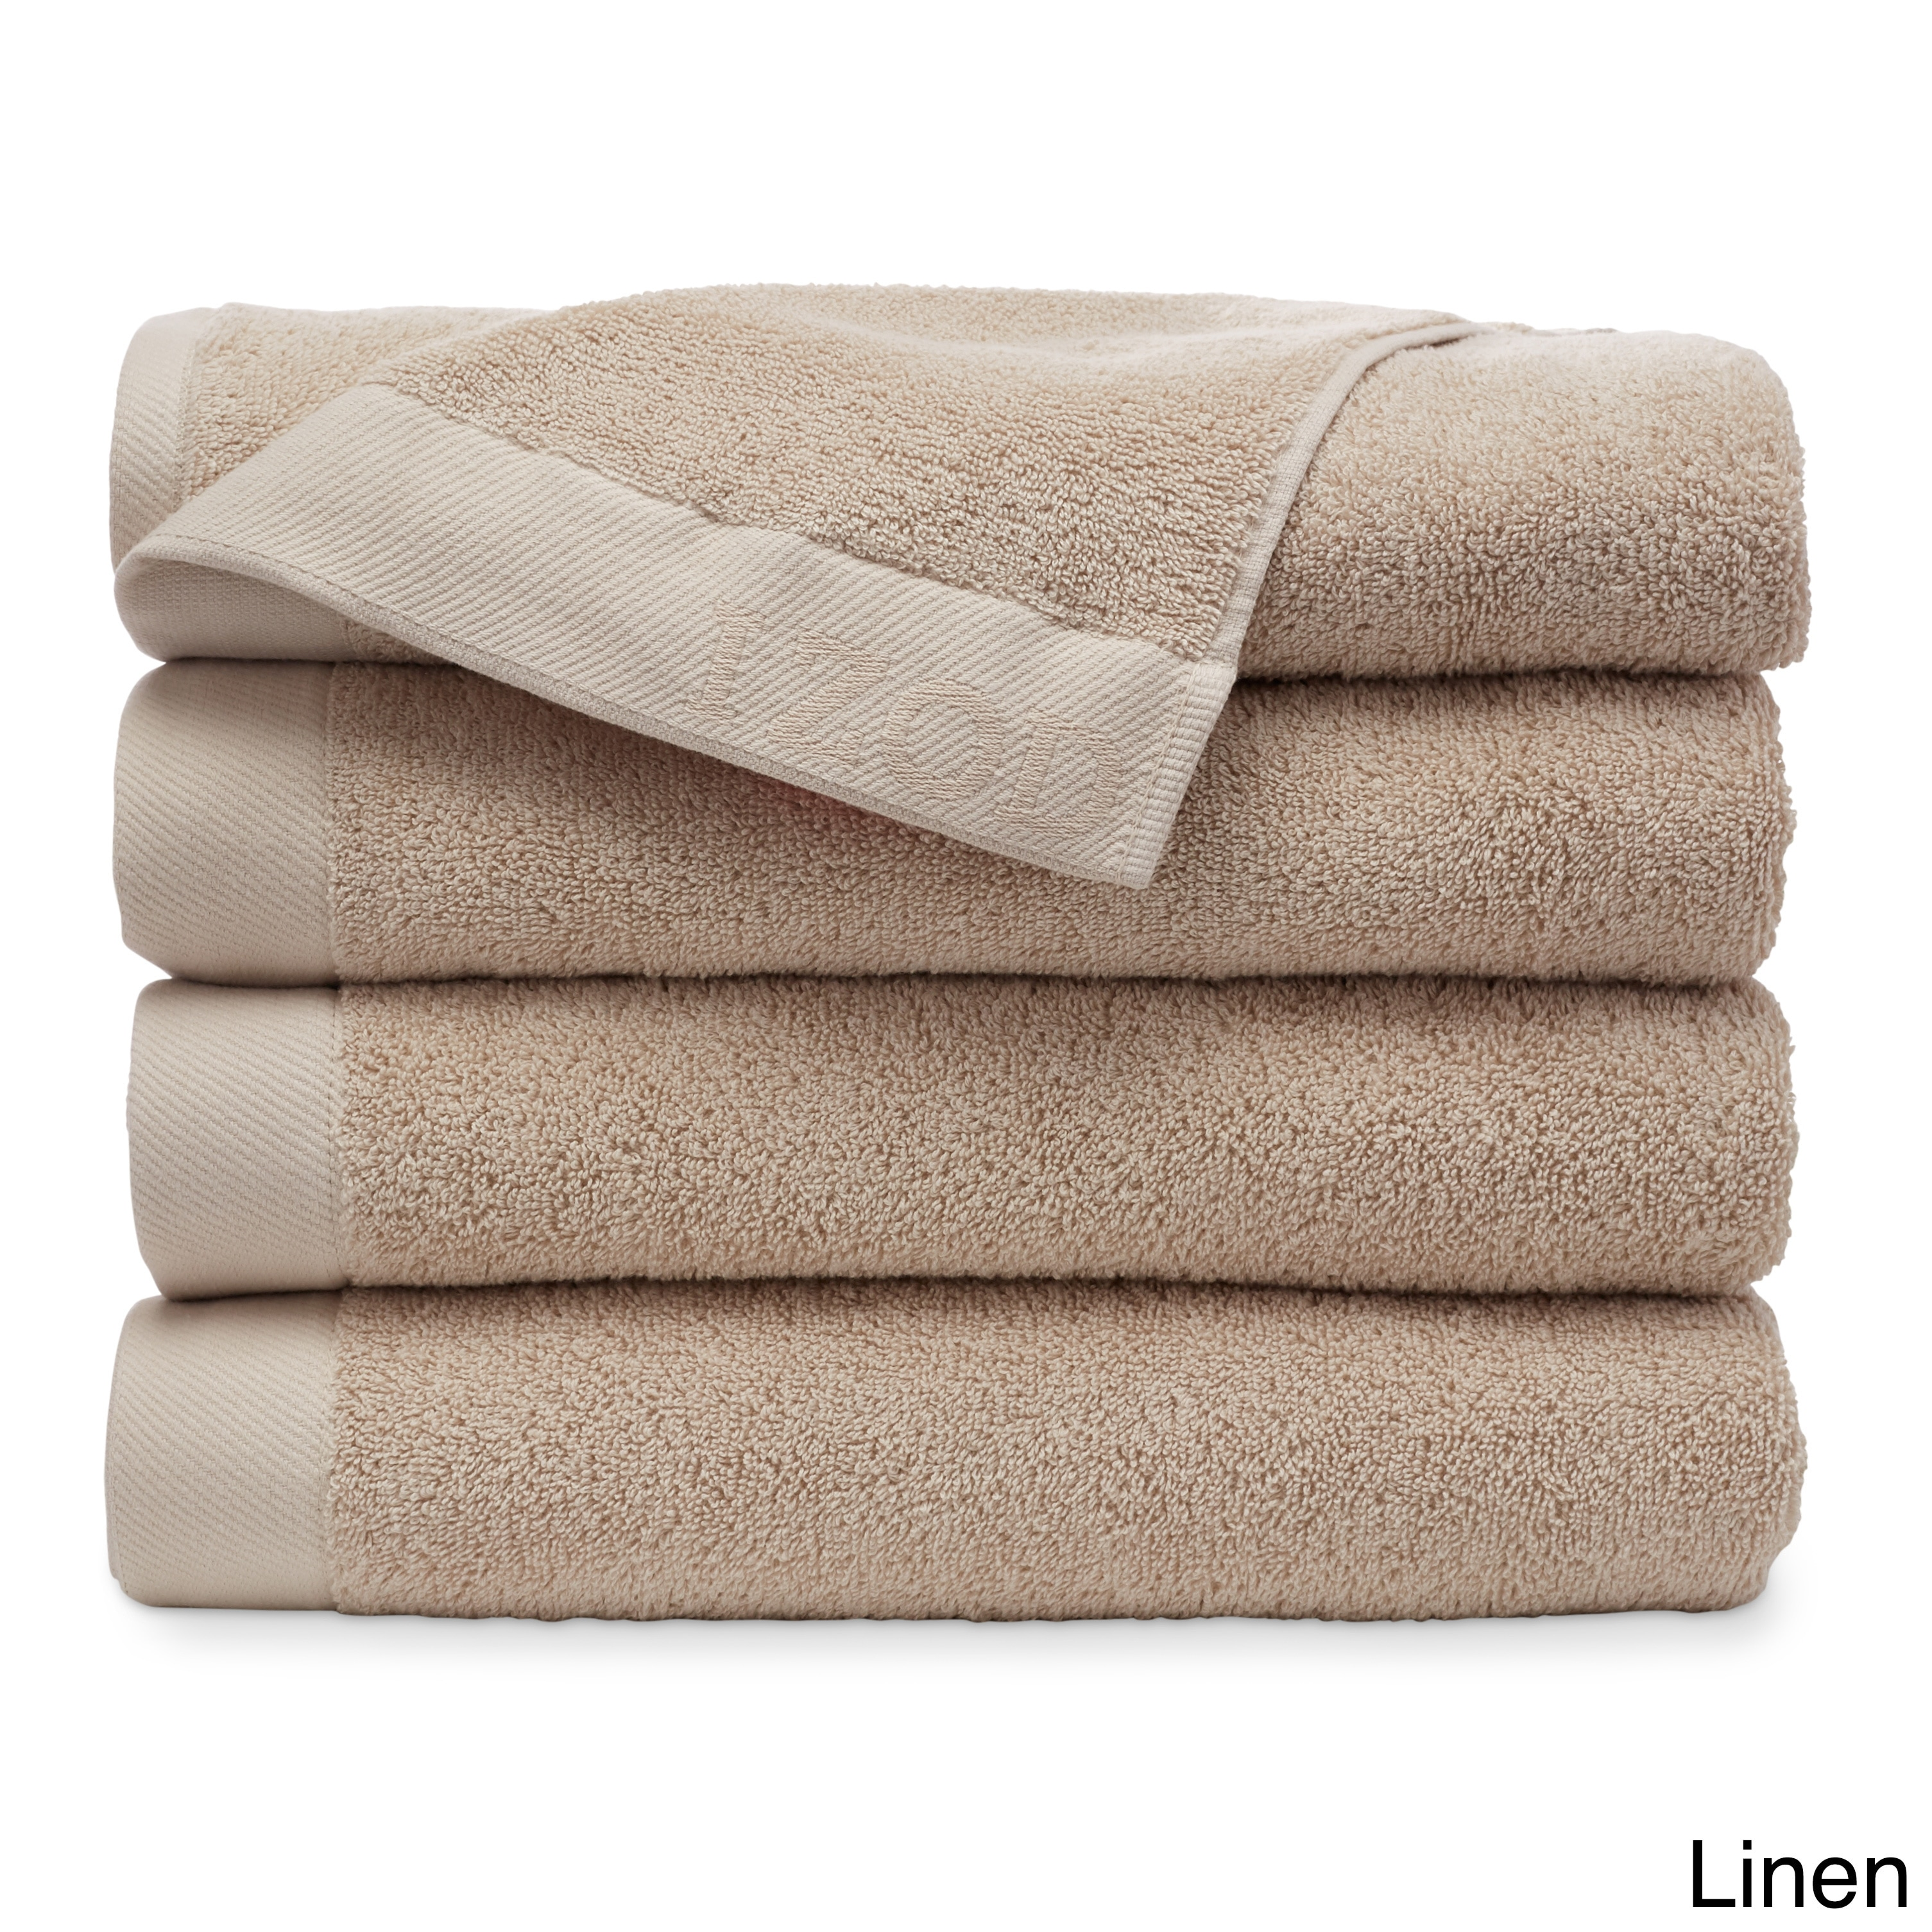 IZOD Classic Egytpian Bath Towel Set Set of 2 by Overstock